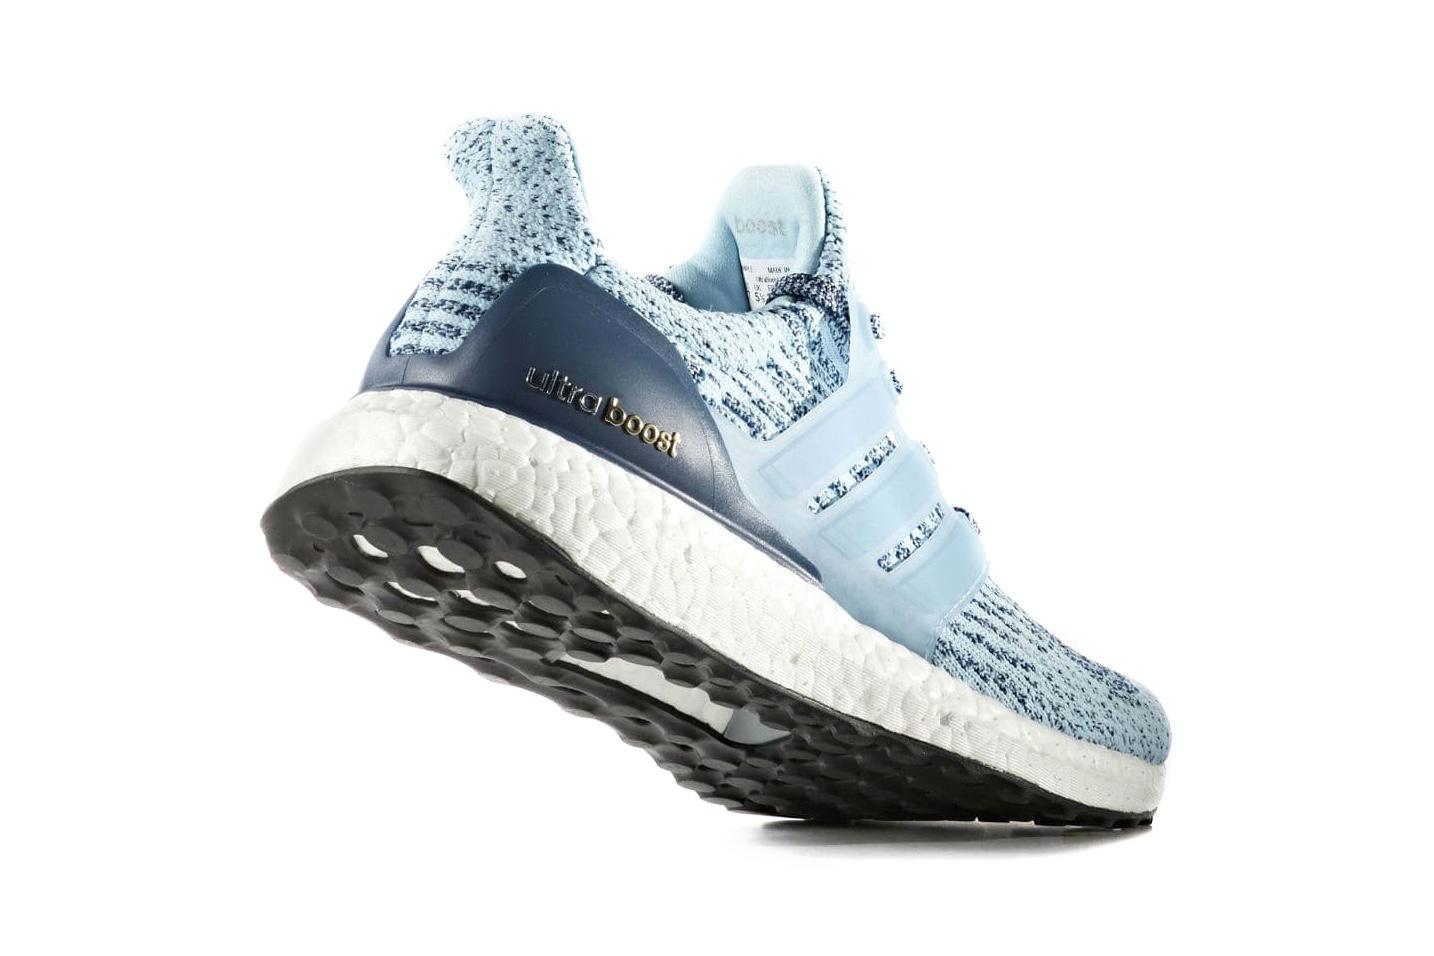 adidas-ultraboost-3-0-icy-blue-2